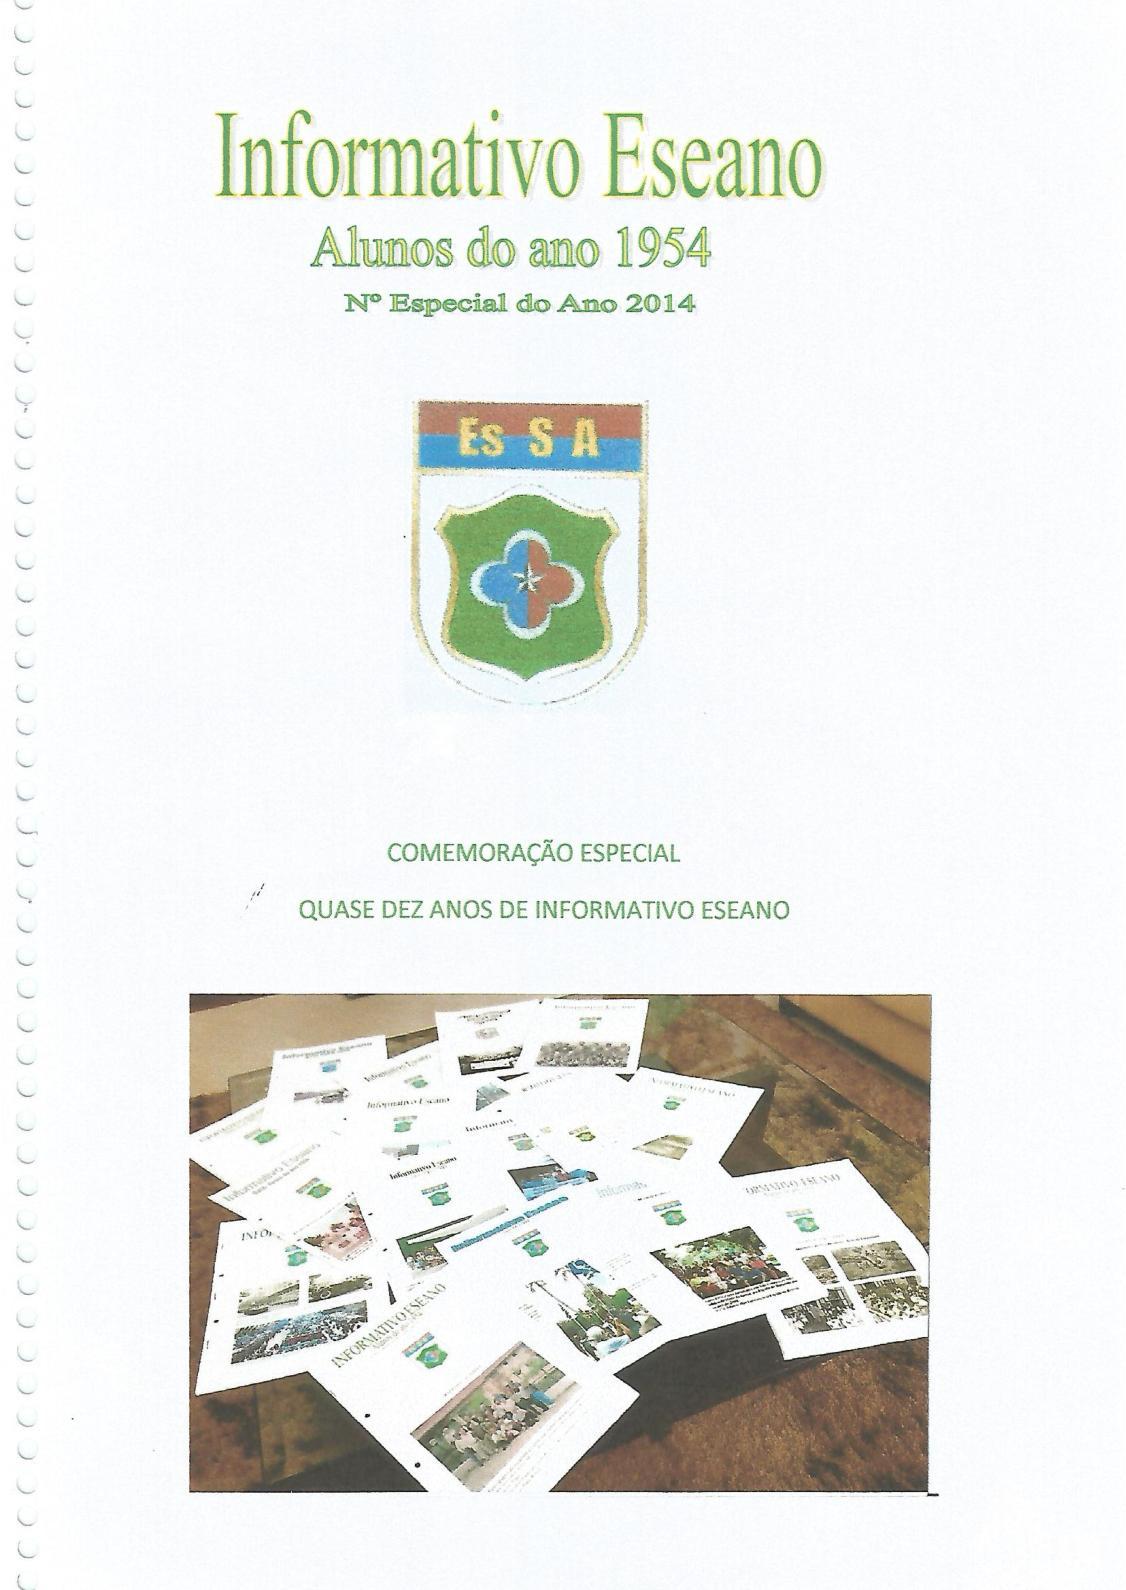 Informativo 1954